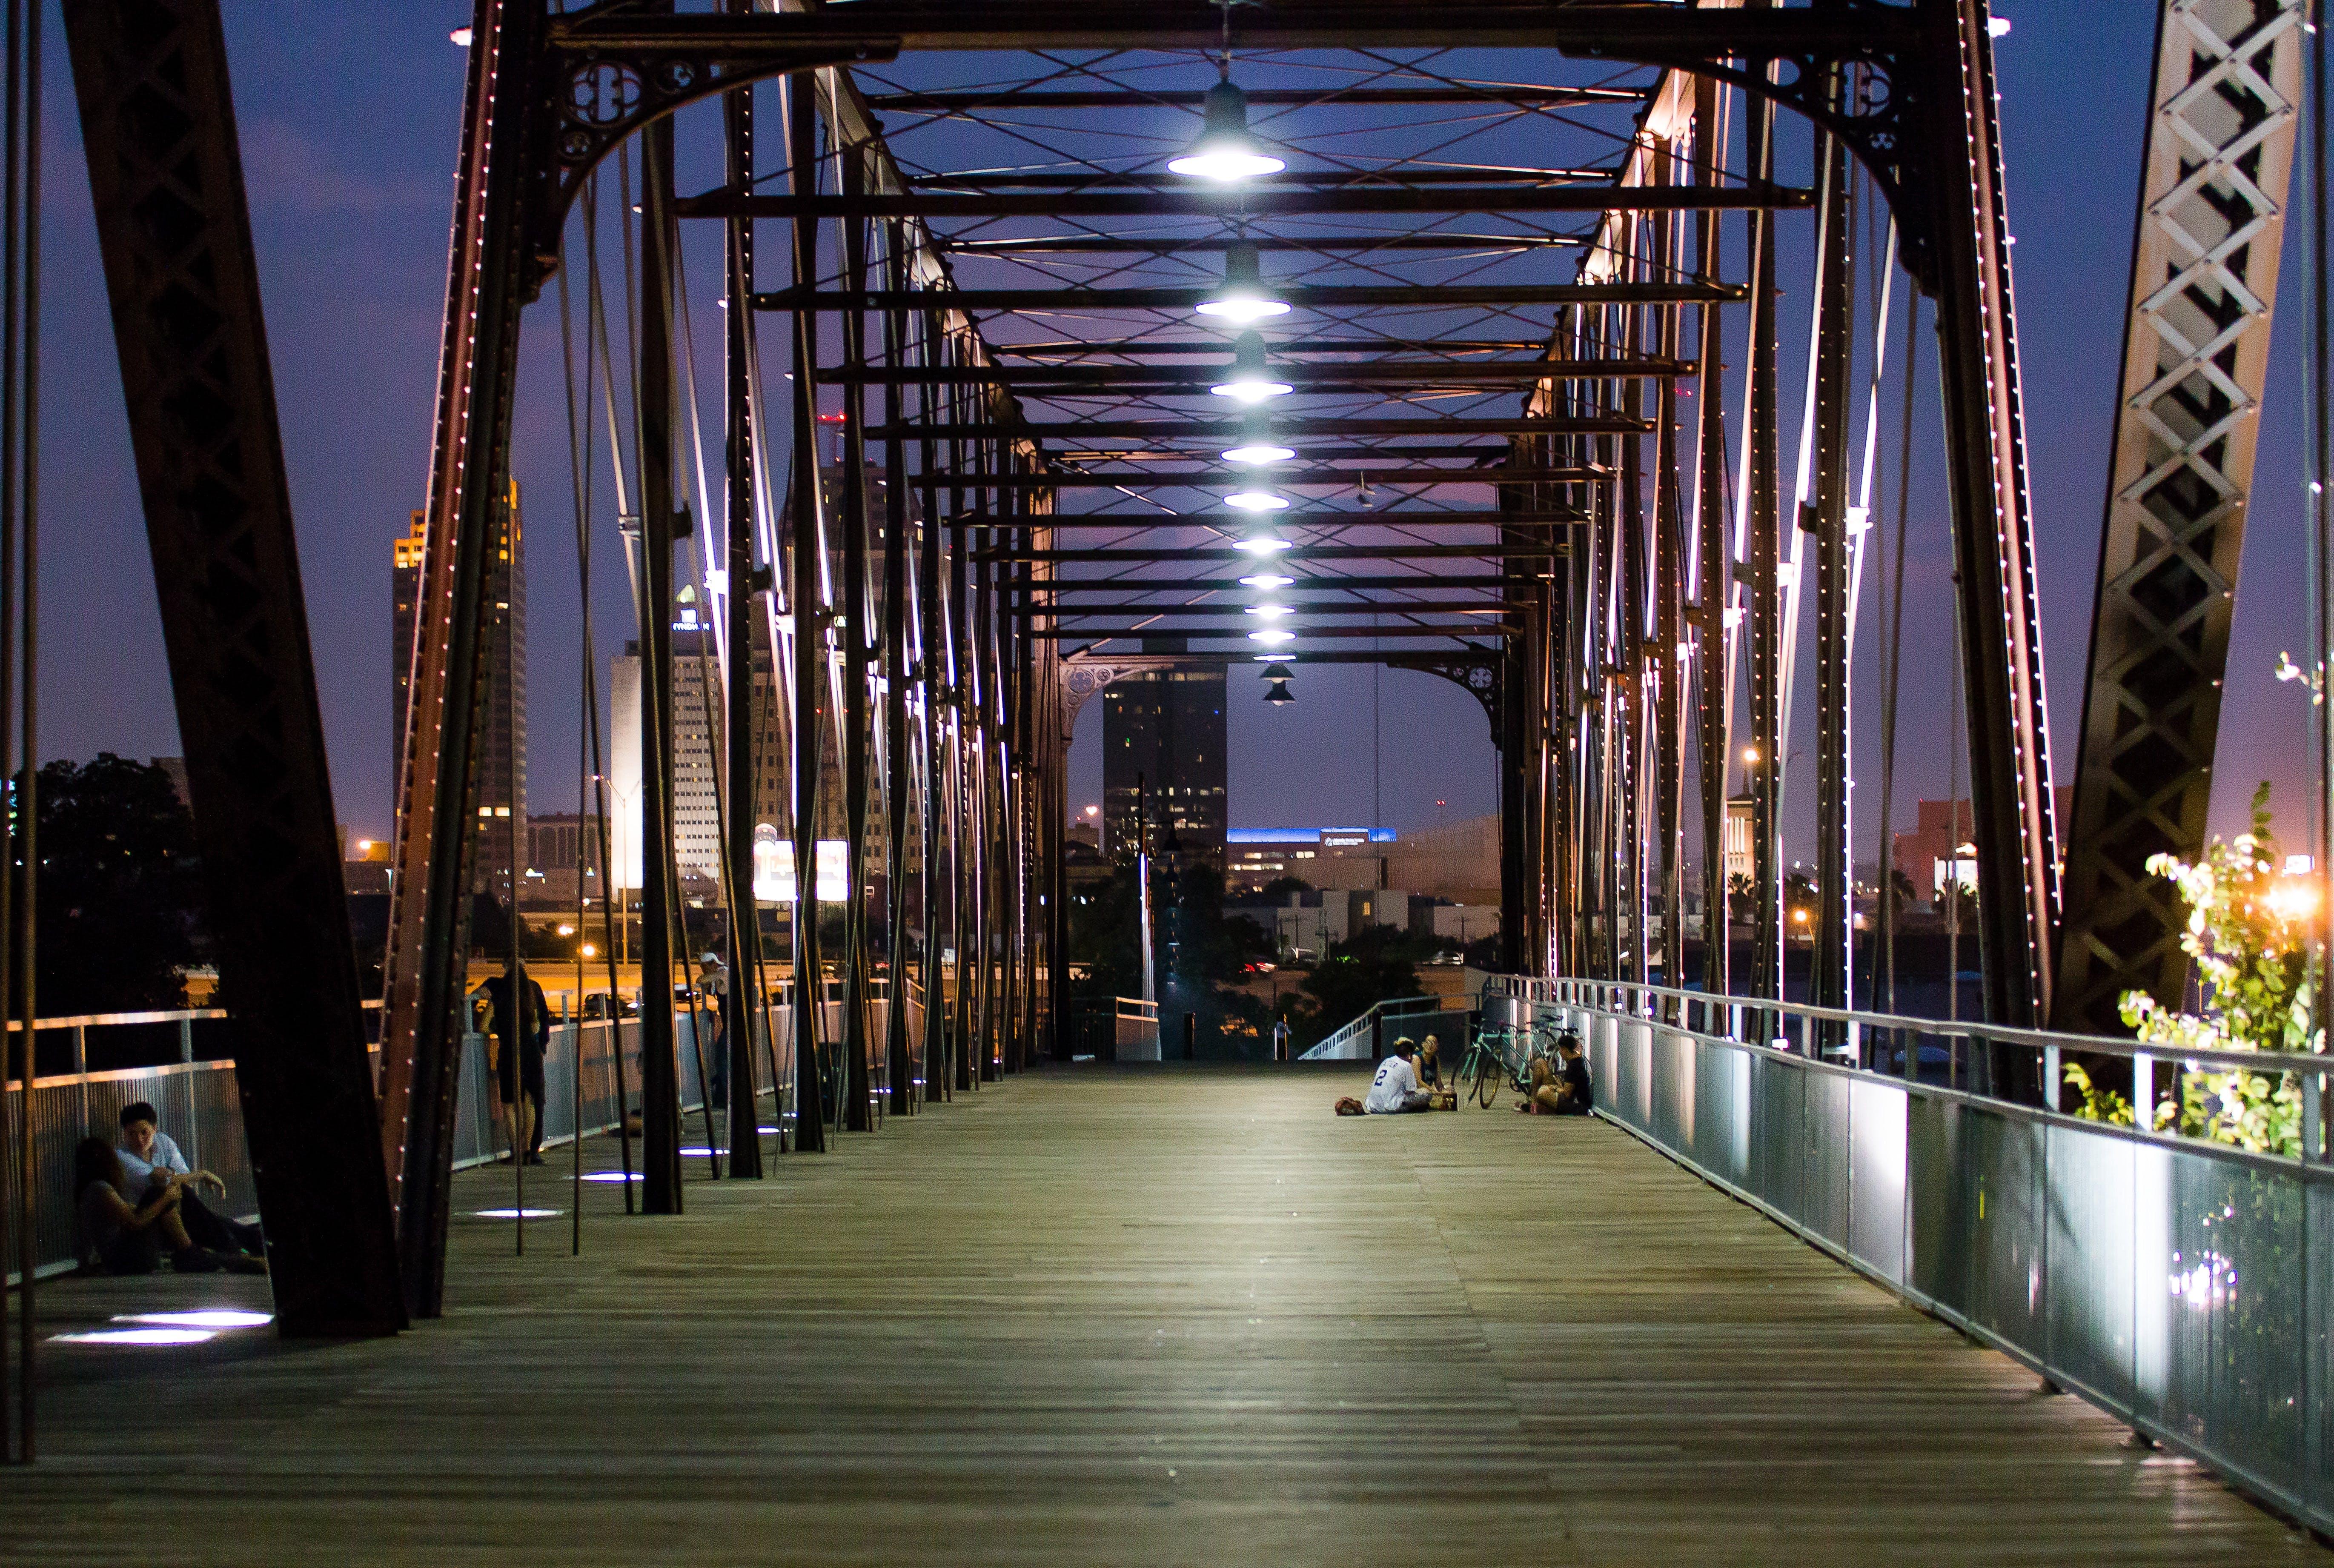 Brown and Silver Steel Suspension Bridge